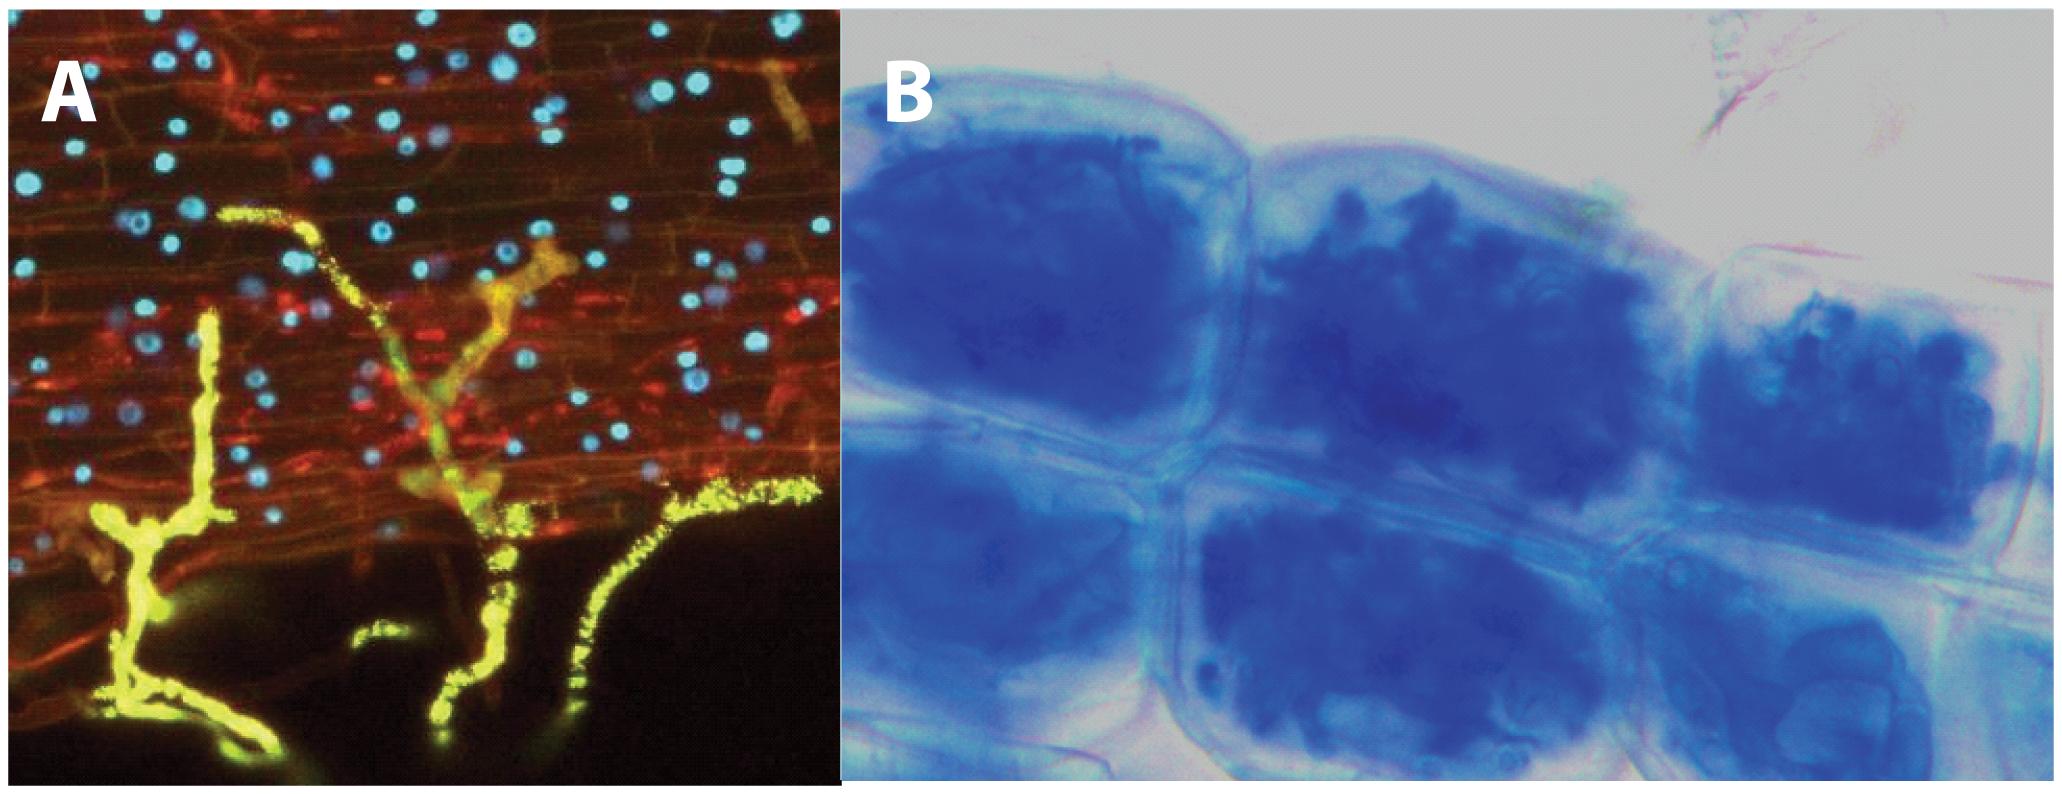 Establishment of the mycorrhizal symbiosis.